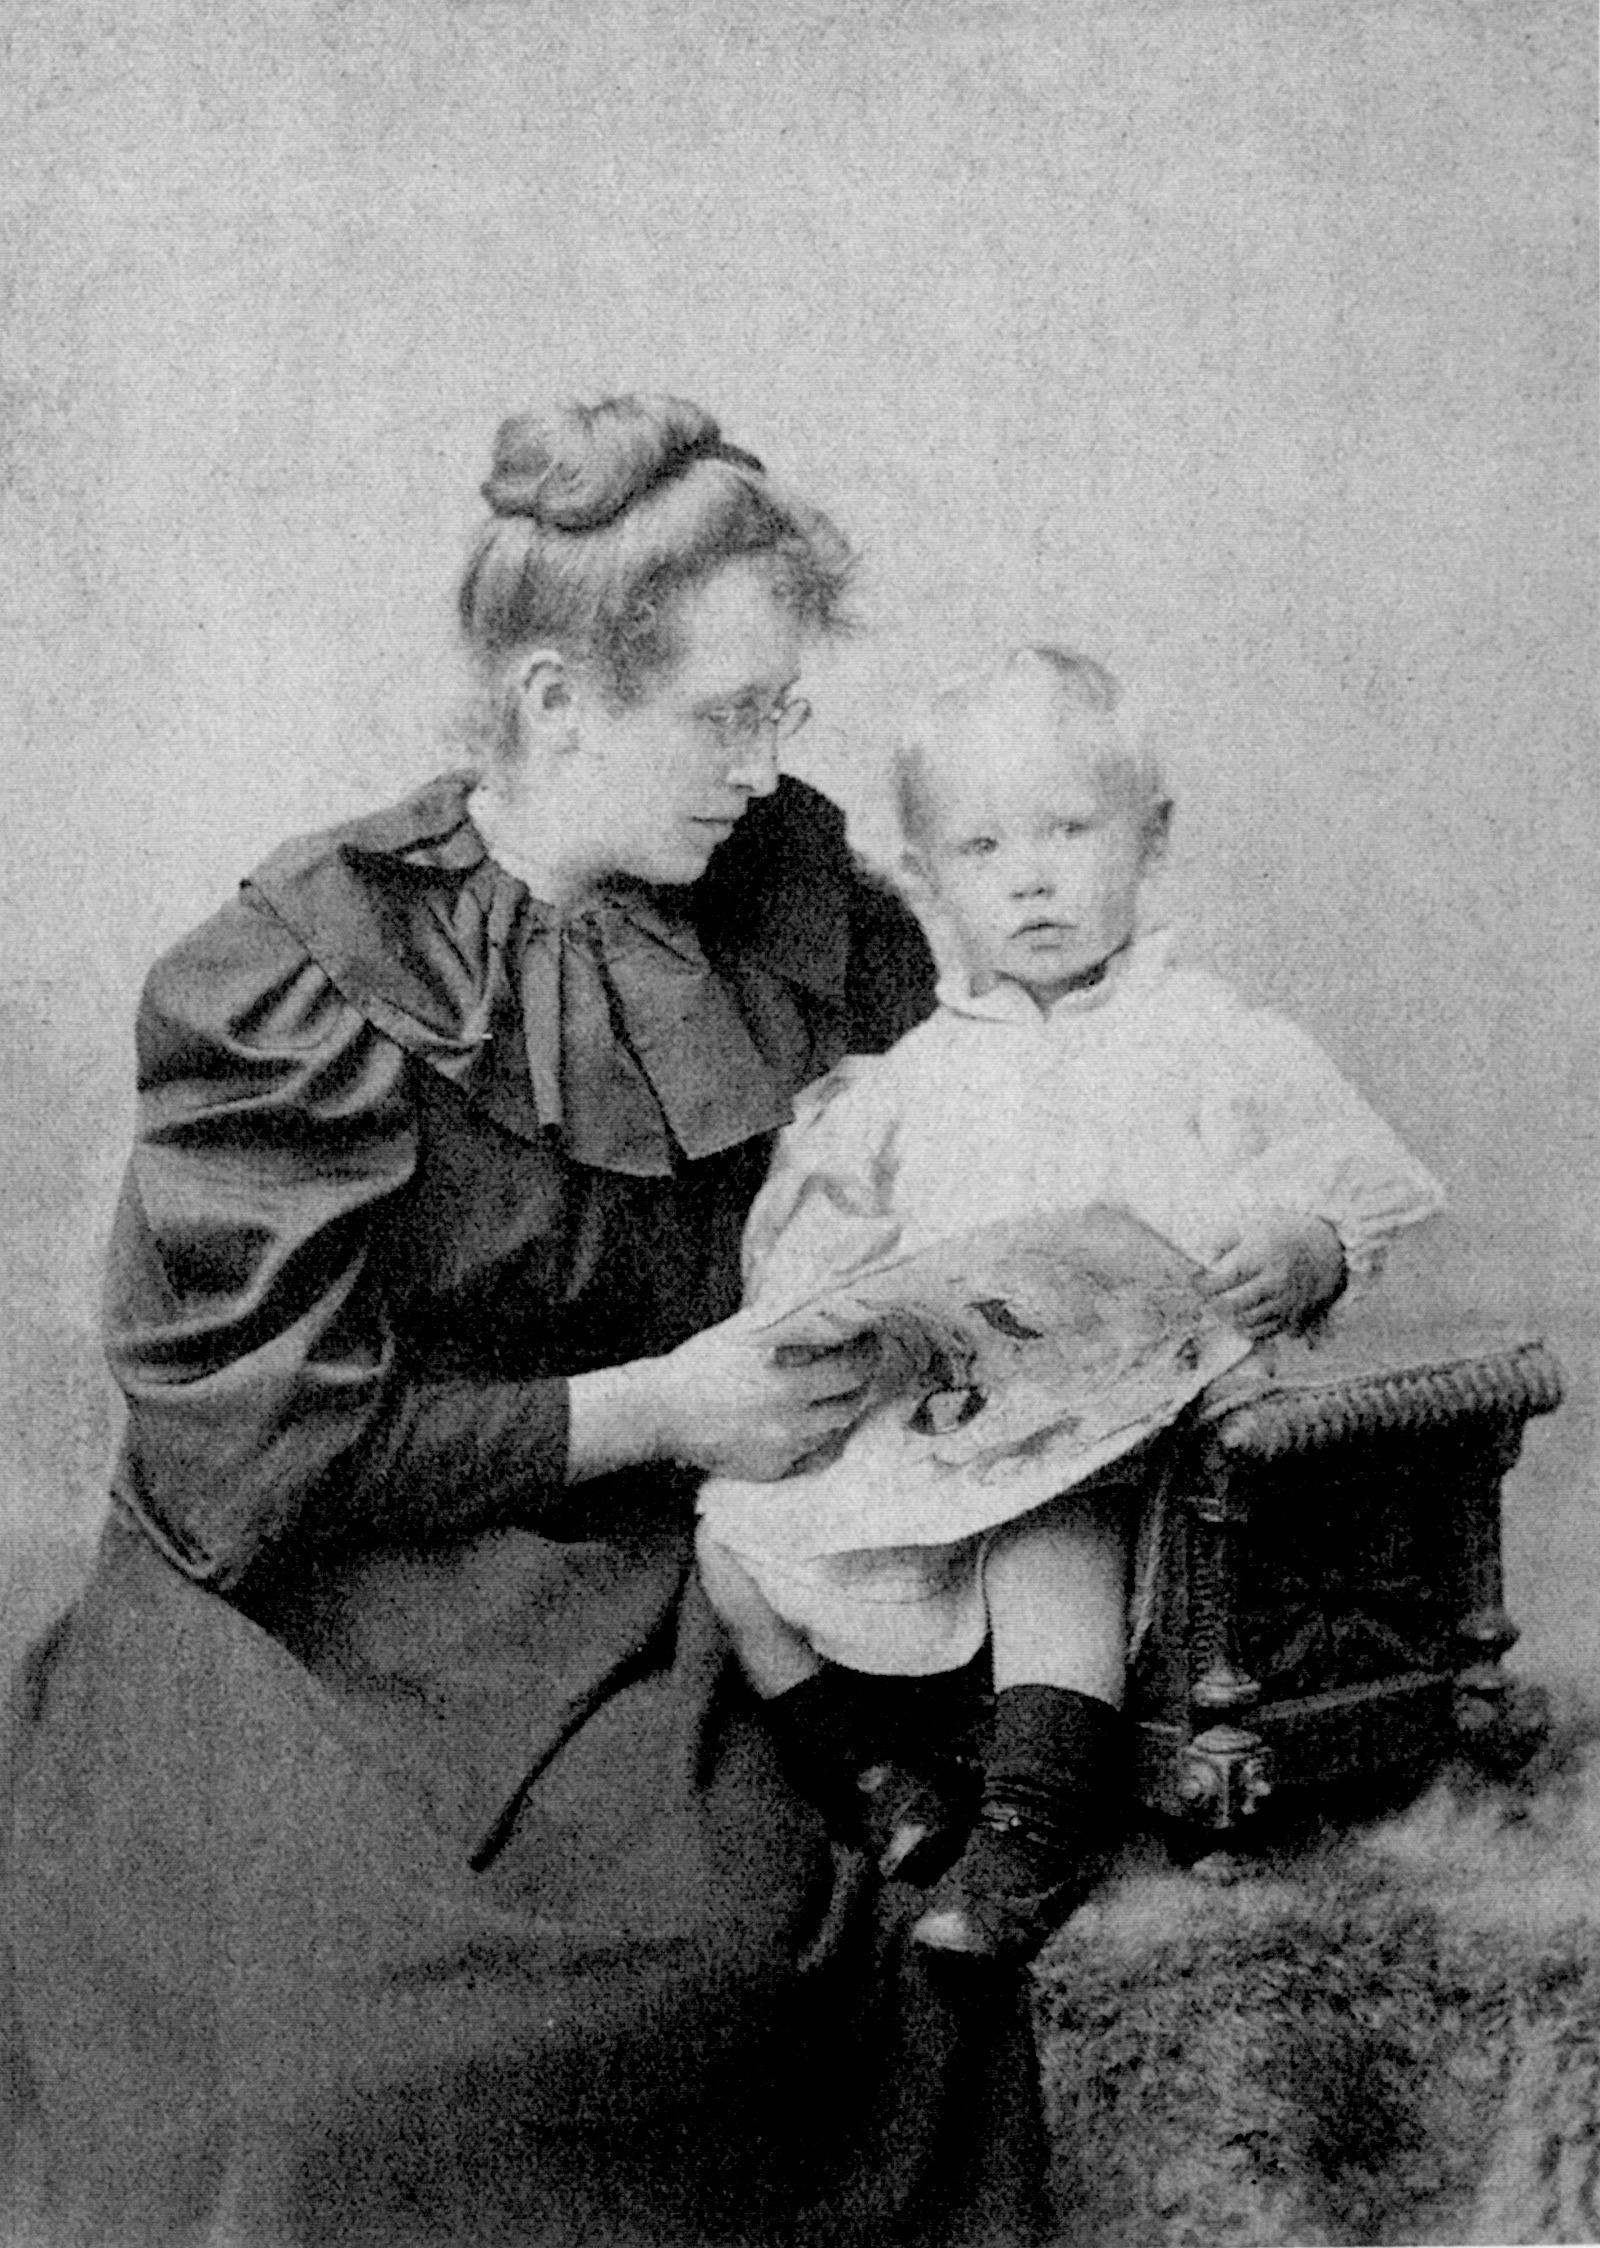 Constance Garnett with [[David Garnett|her son David]] in the mid-1890s